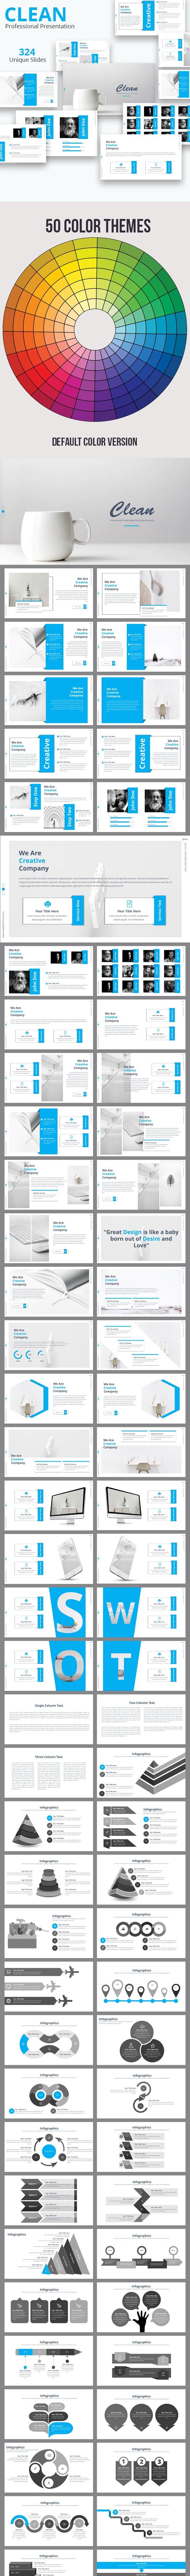 Clean Premium Keynote Presentation Templatee - Business Keynote Templates